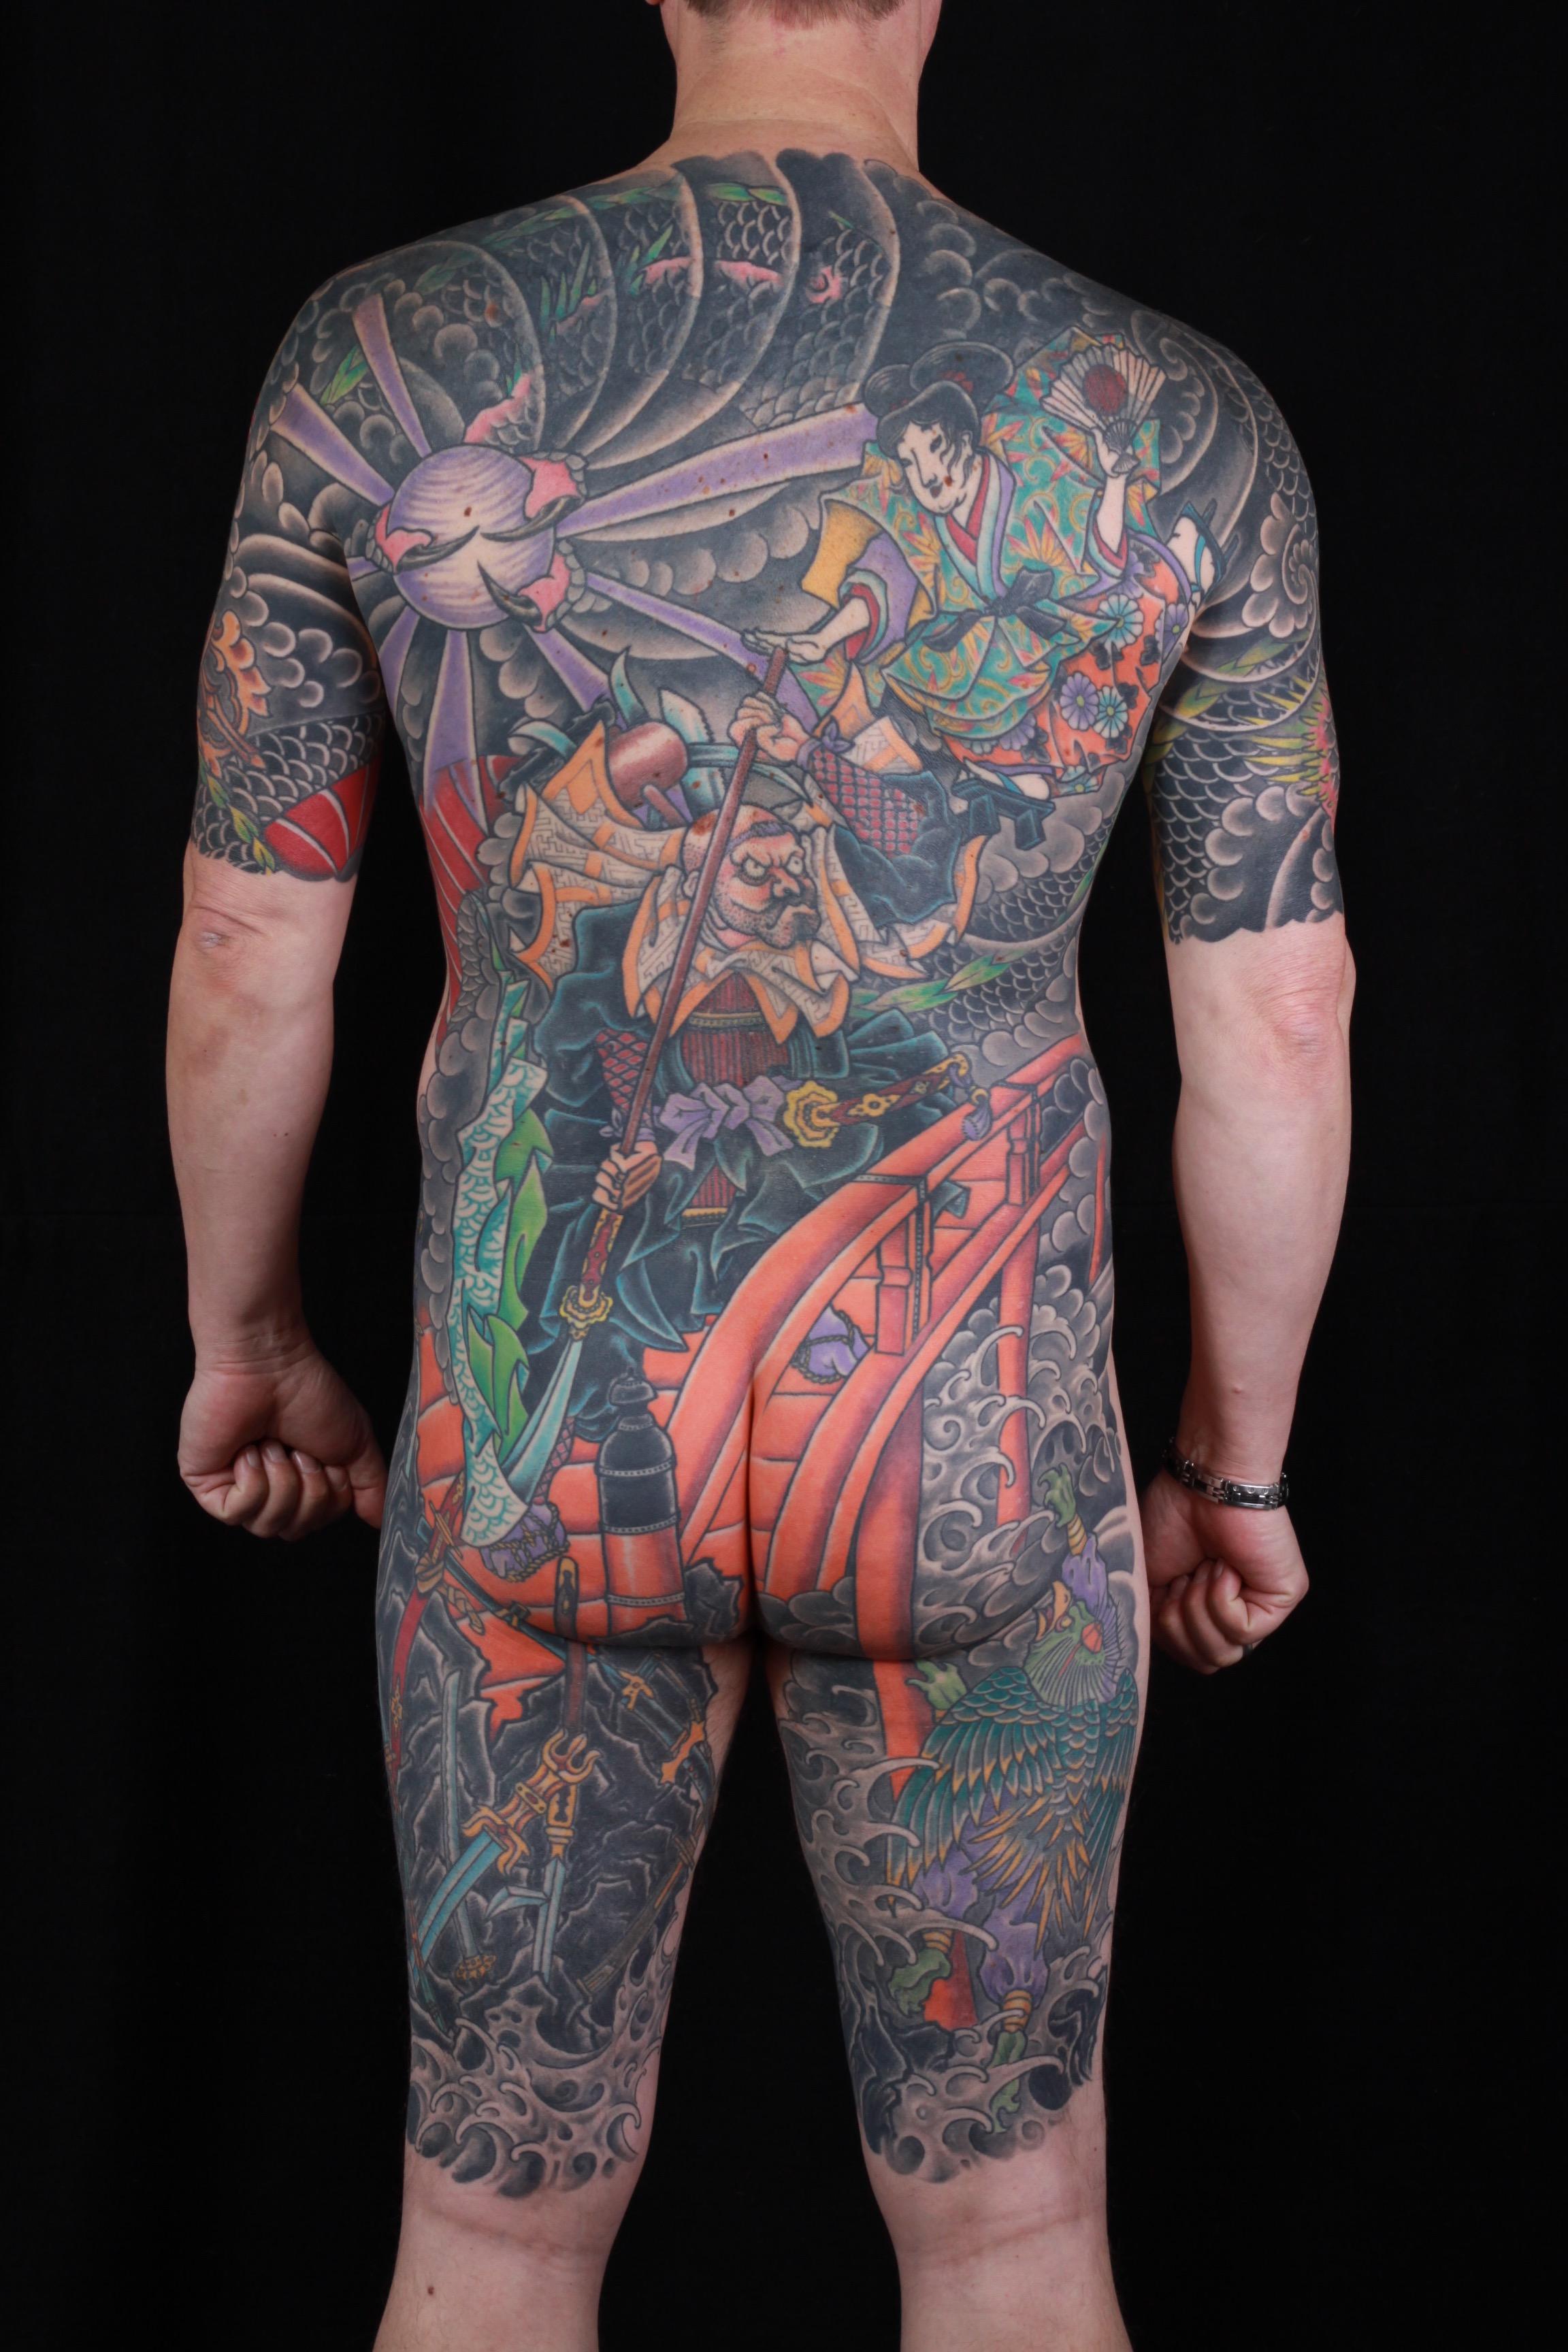 sam-yamini-dedication-tattoo-benkei-yoshitsune-japanese-backpiece-dragon